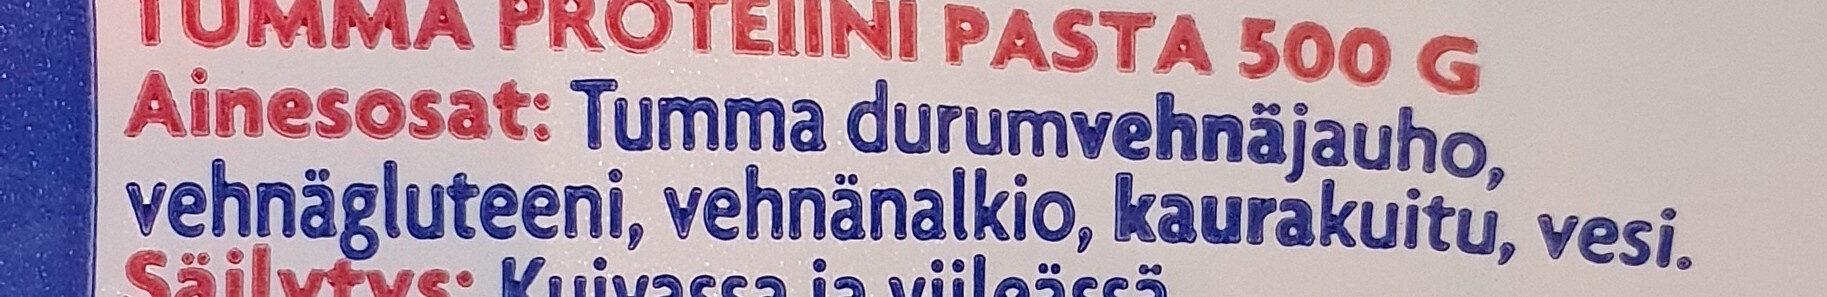 Tumma Proteiini Pasta - Ingrédients - fi